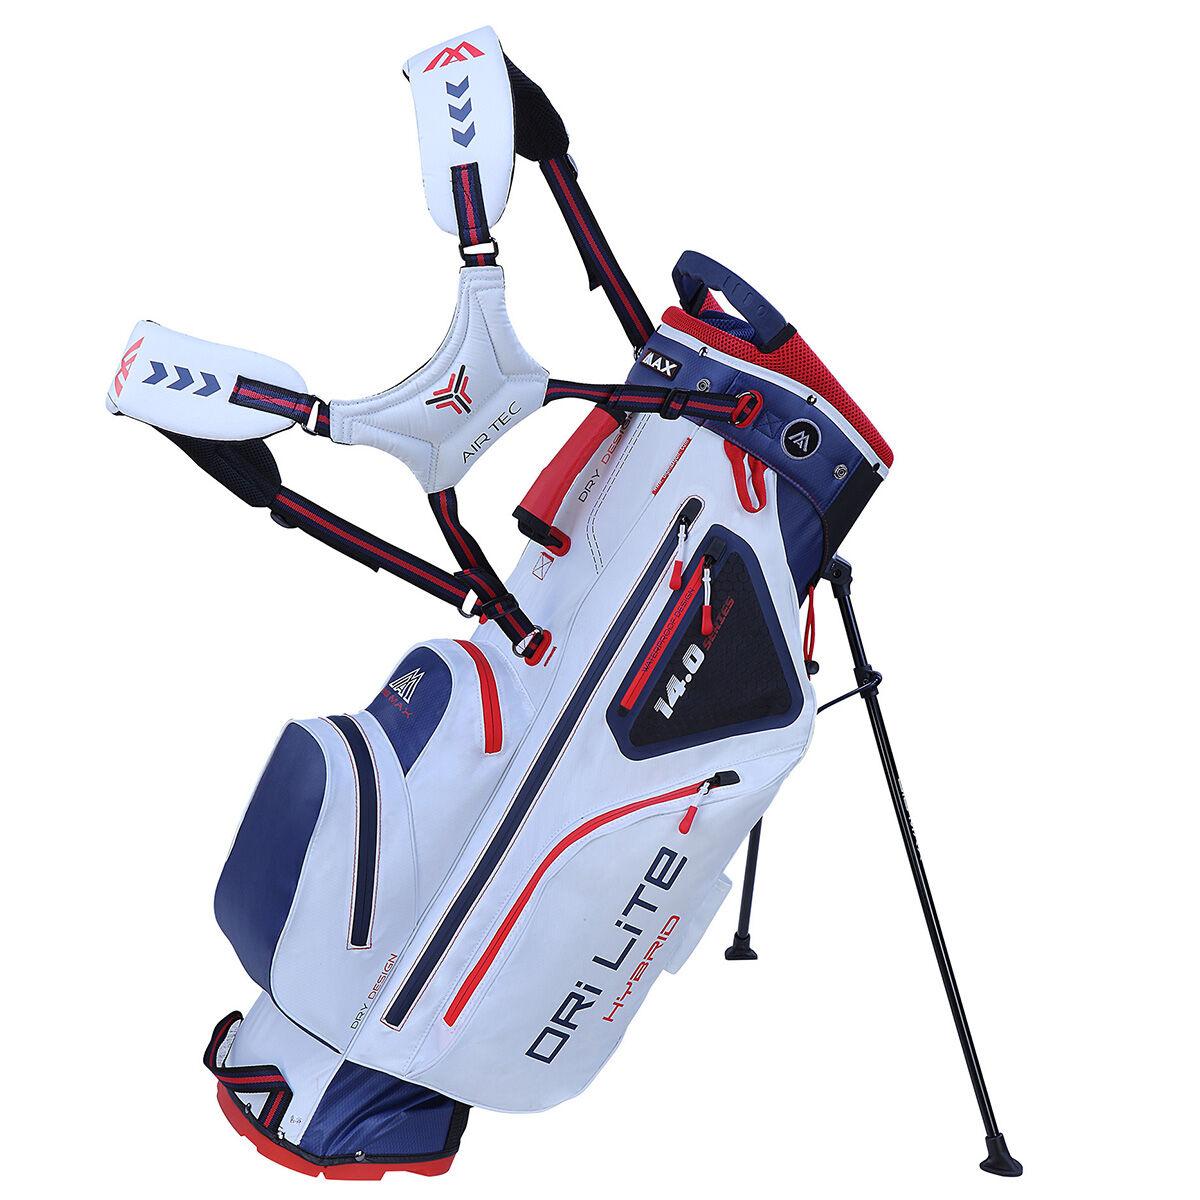 BIG MAX DRI LITE Hybrid Golf Stand Bag, White/navy/red | American Golf